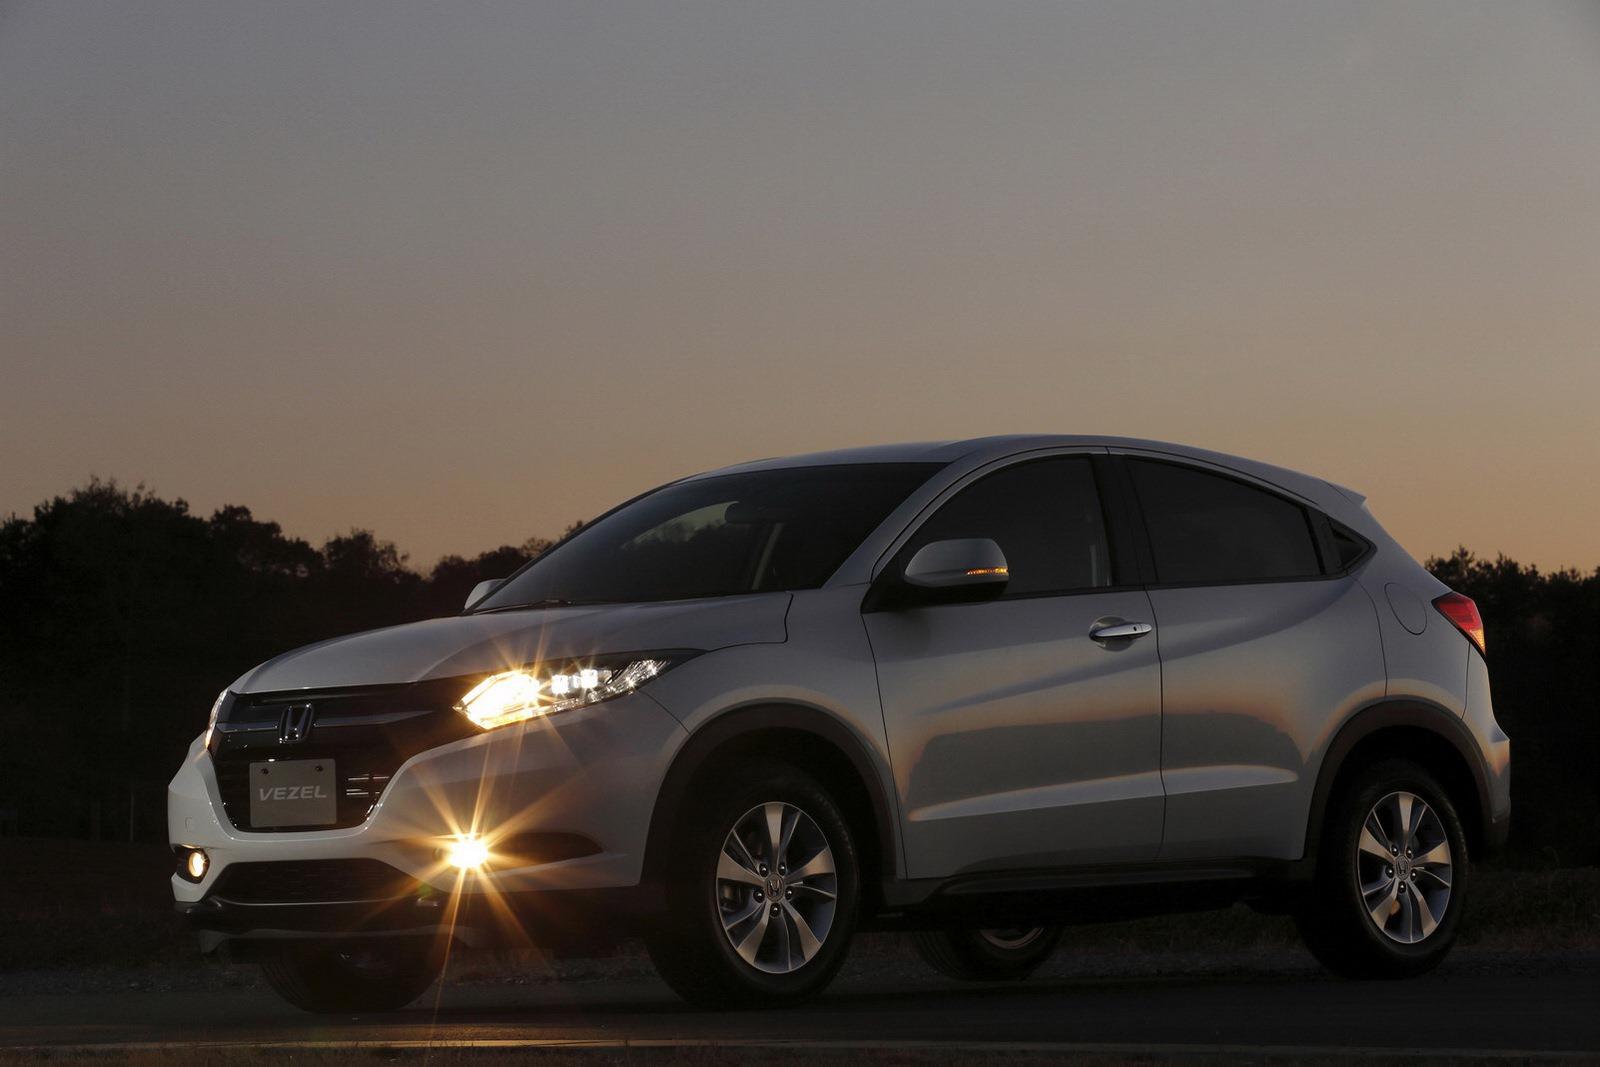 2014 - [Honda] Vezel / HR-V - Page 2 New-Honda-Vezel-33%25255B2%25255D